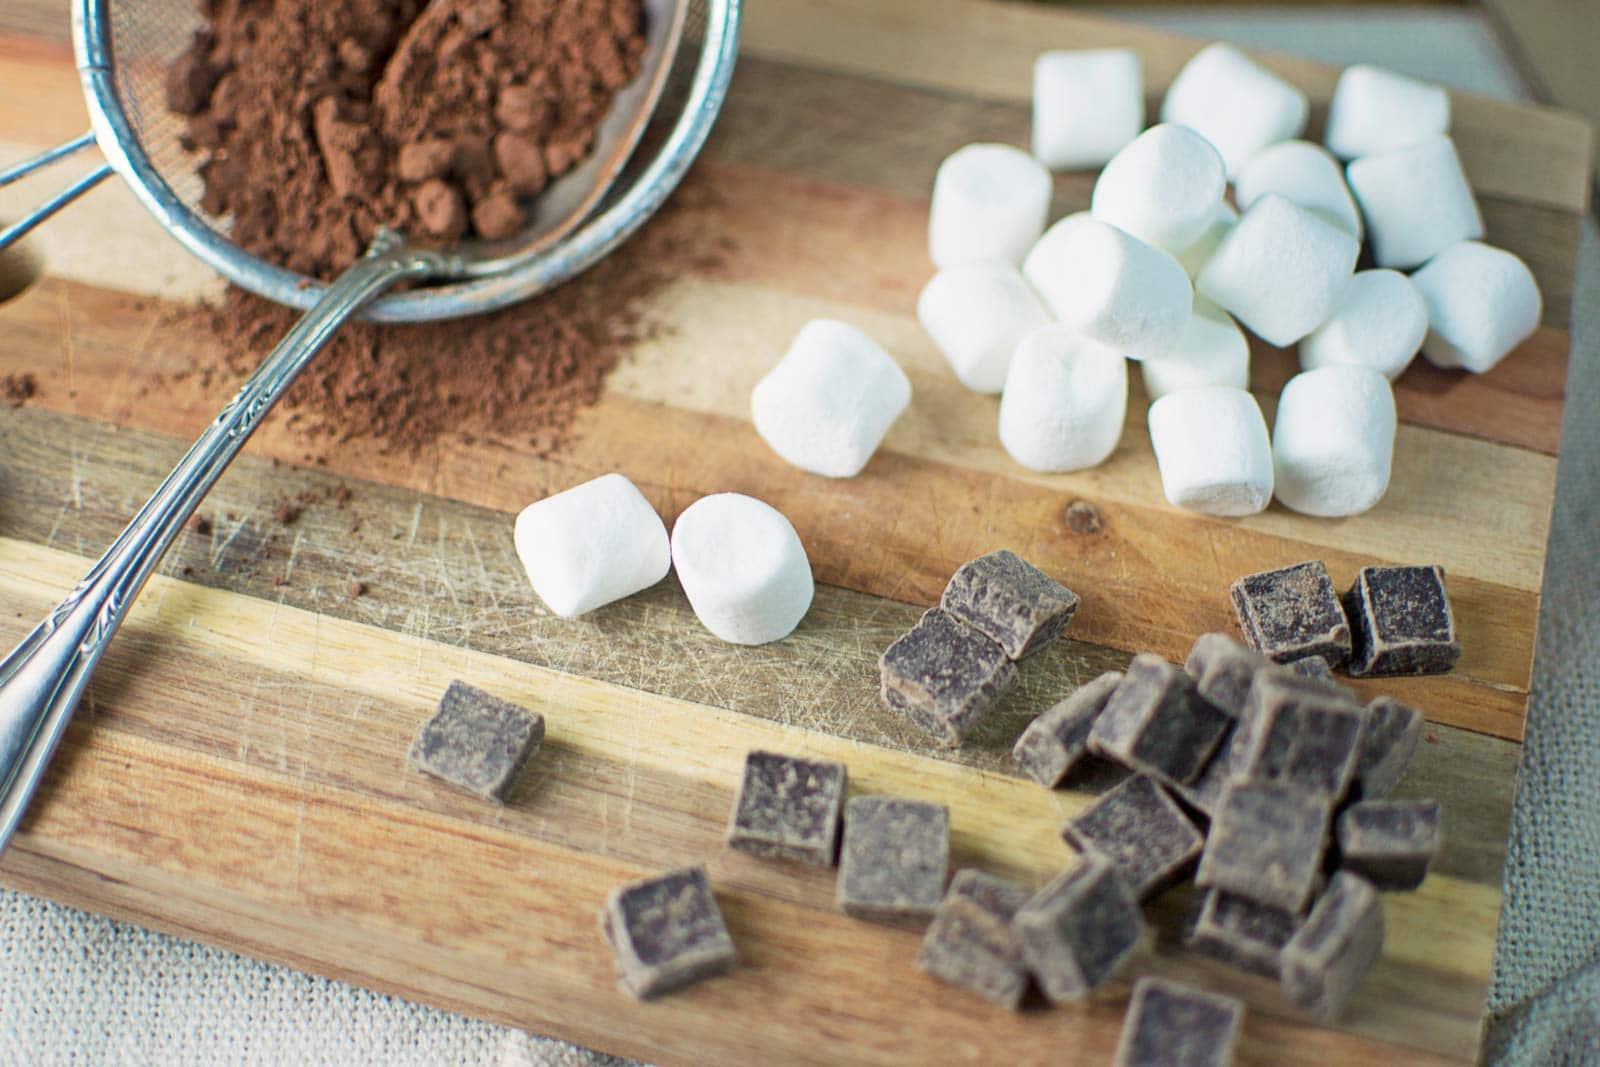 Hot Cocoa Mix - #HotCocoa - #GiftsFromTheKitchen - @LittleFiggyFood